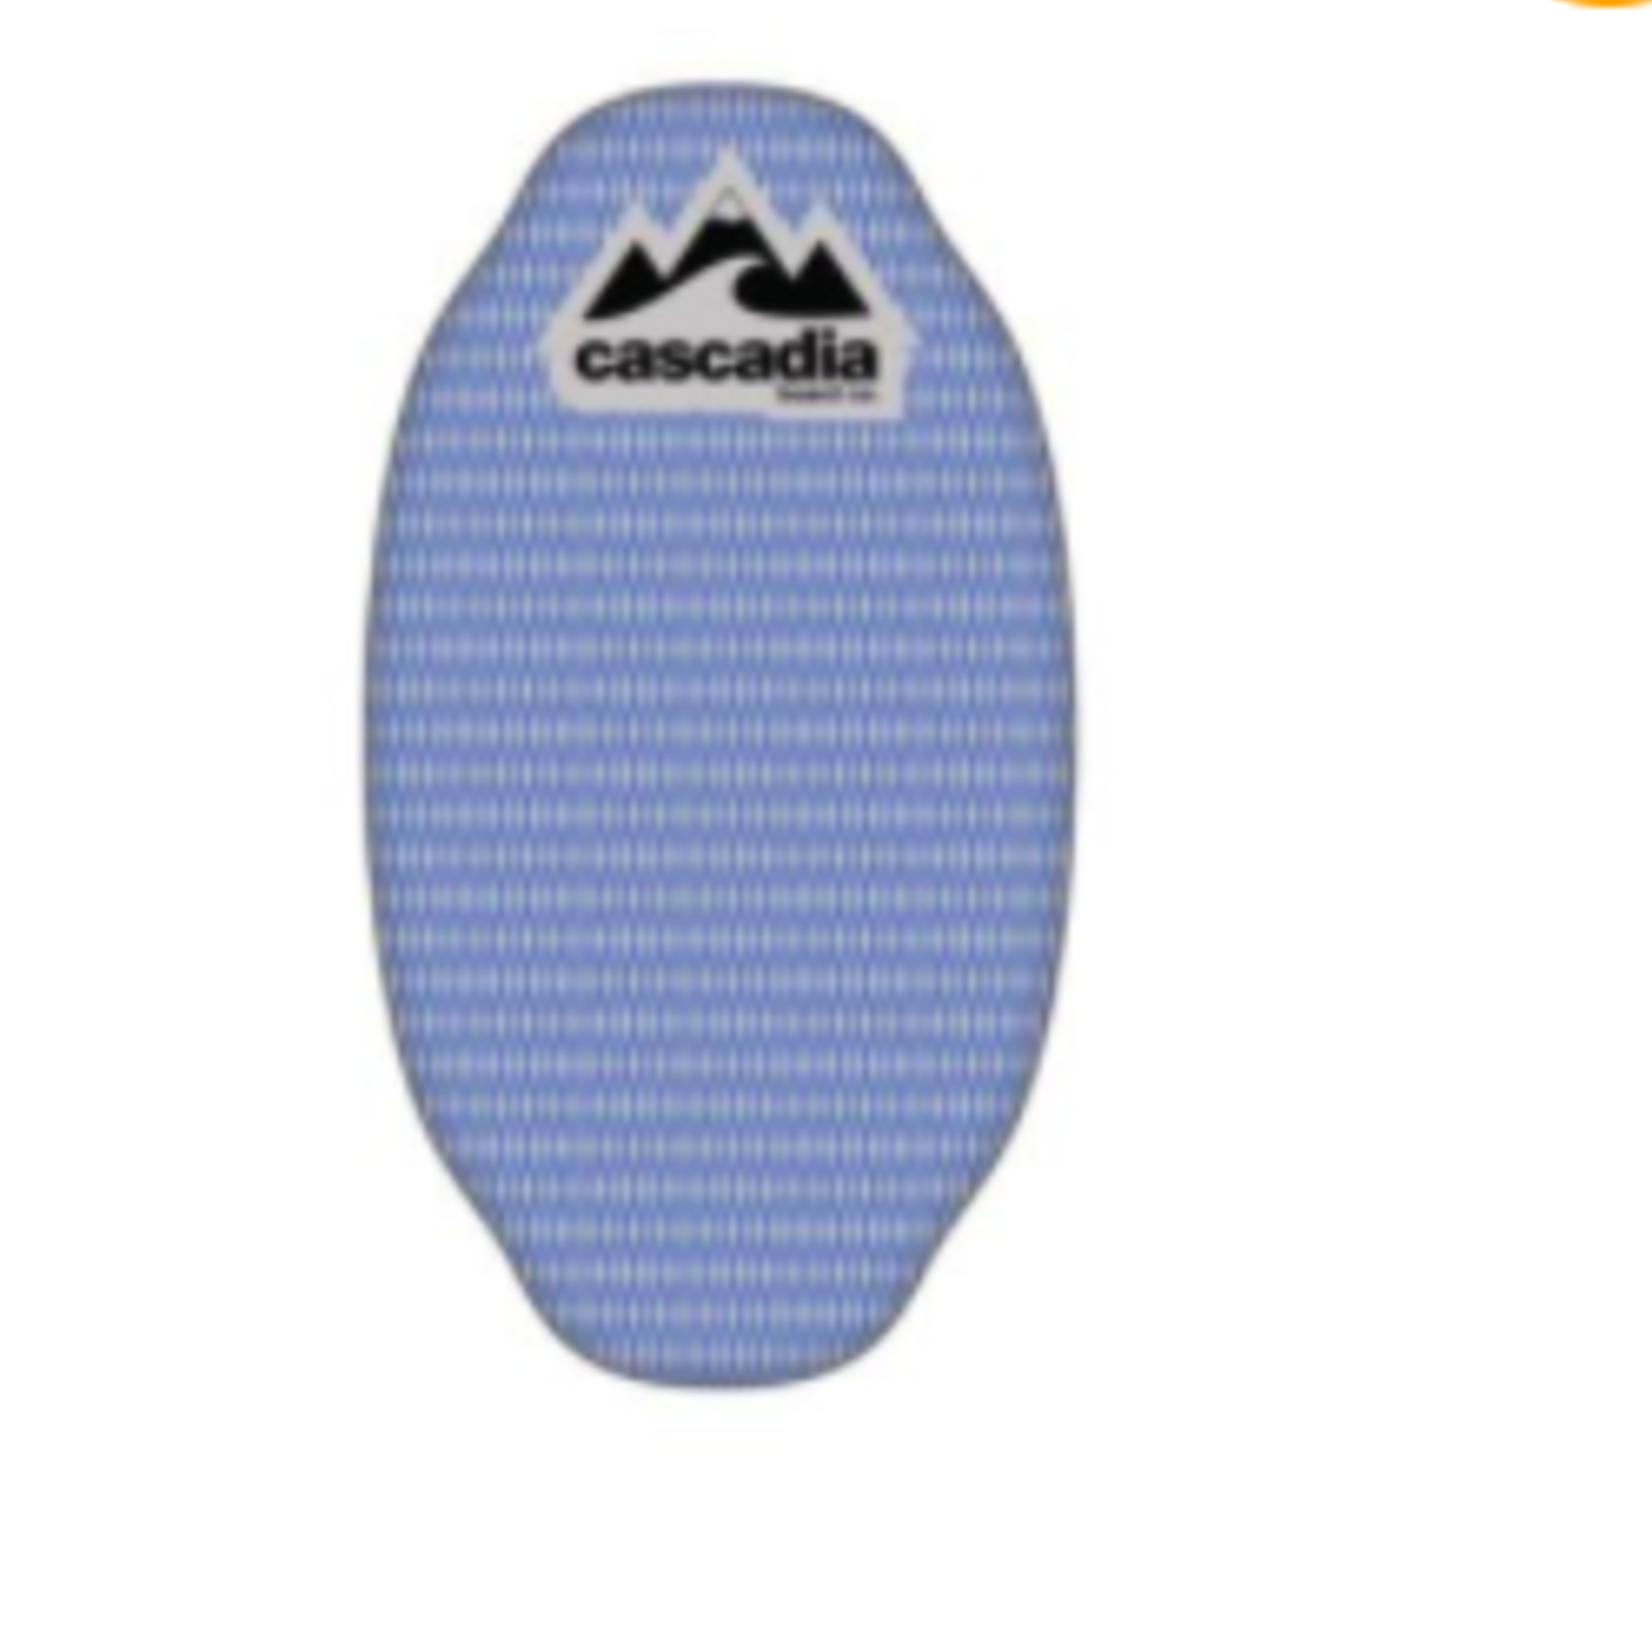 Cascadia Board Co. Cascadia Legacy Skim Board